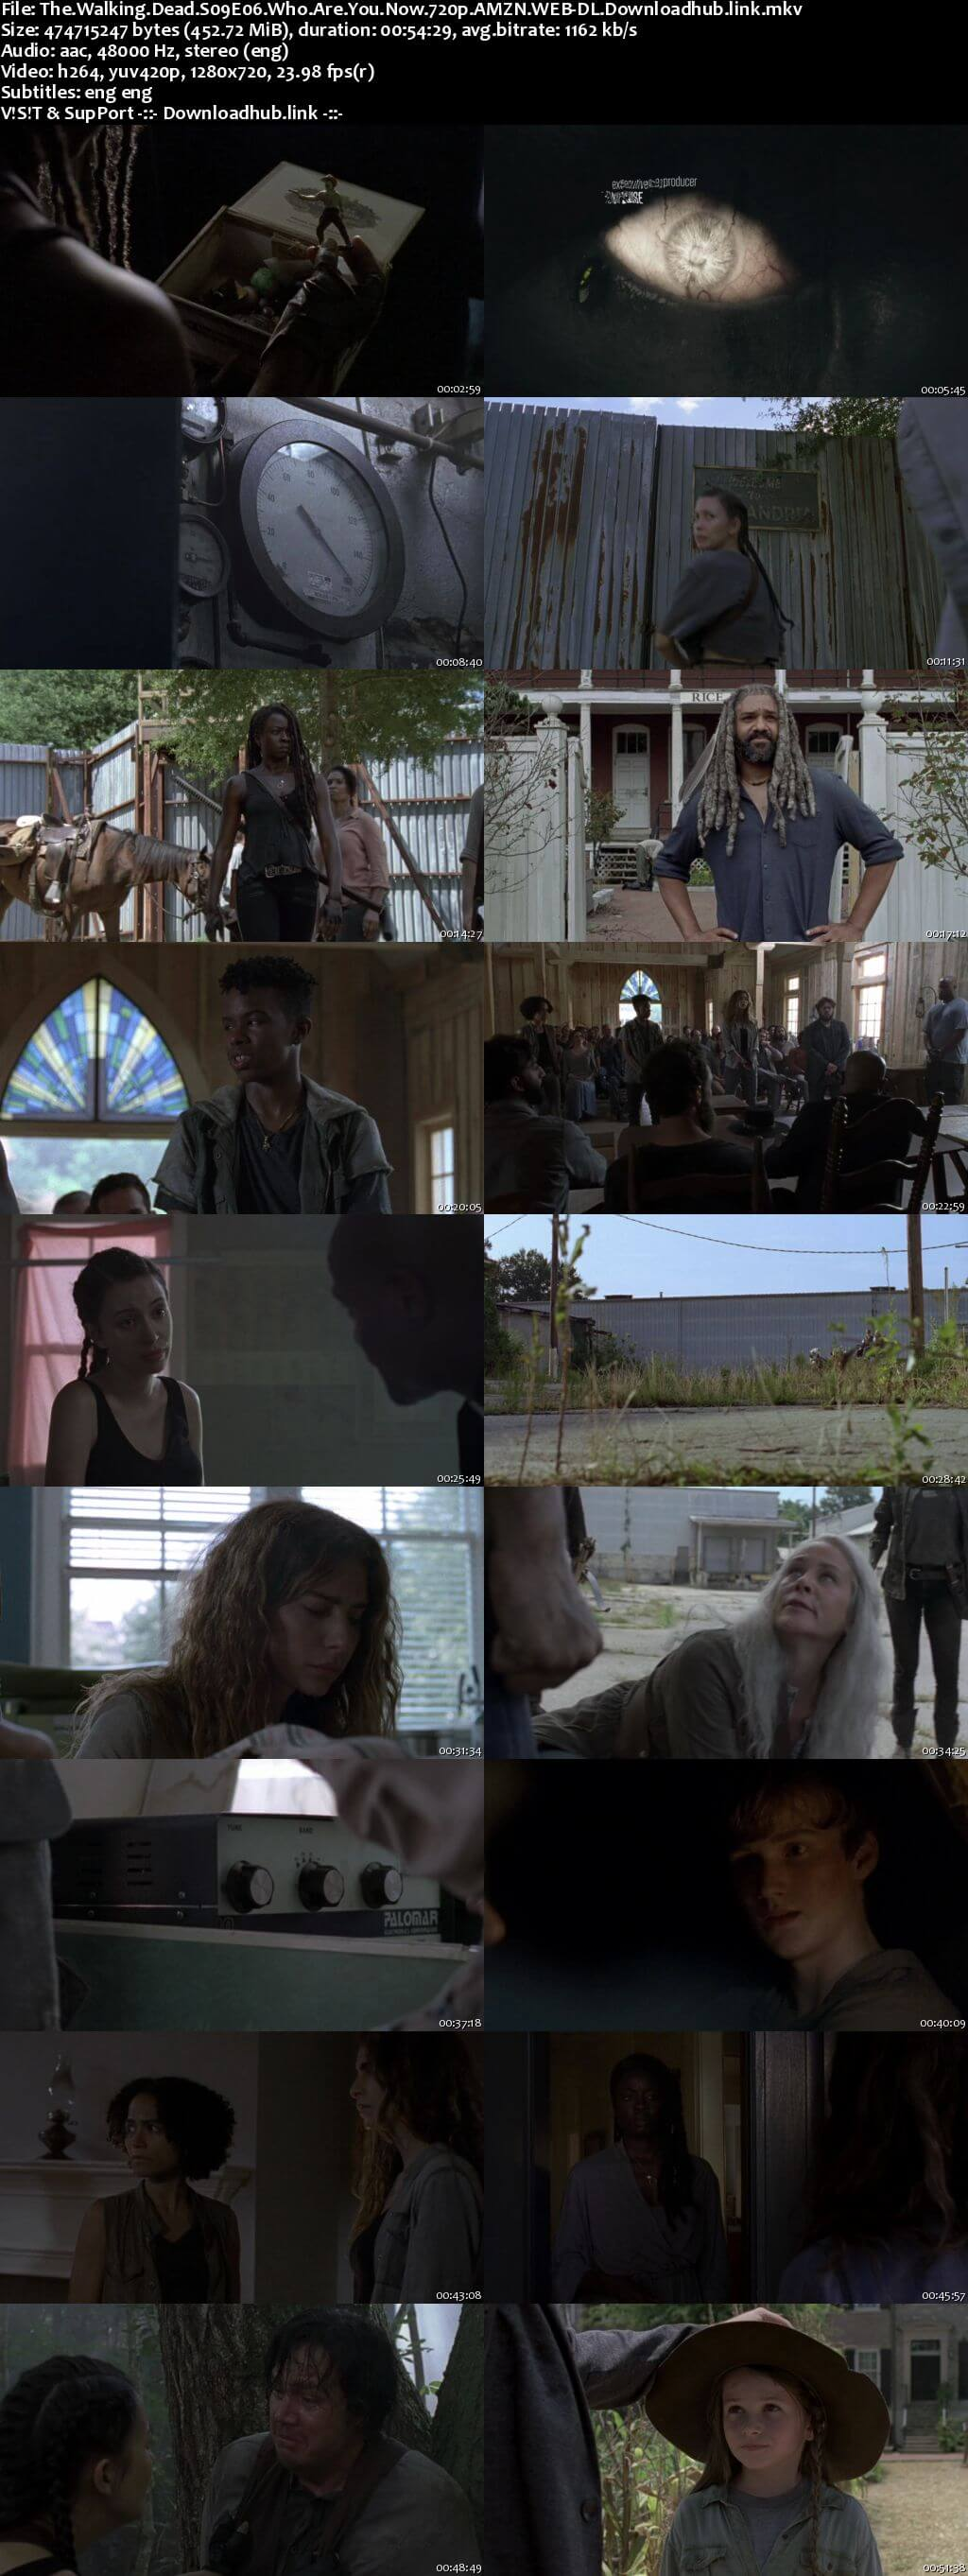 The Walking Dead S09E06 450MB AMZN WEB-DL 720p ESubs